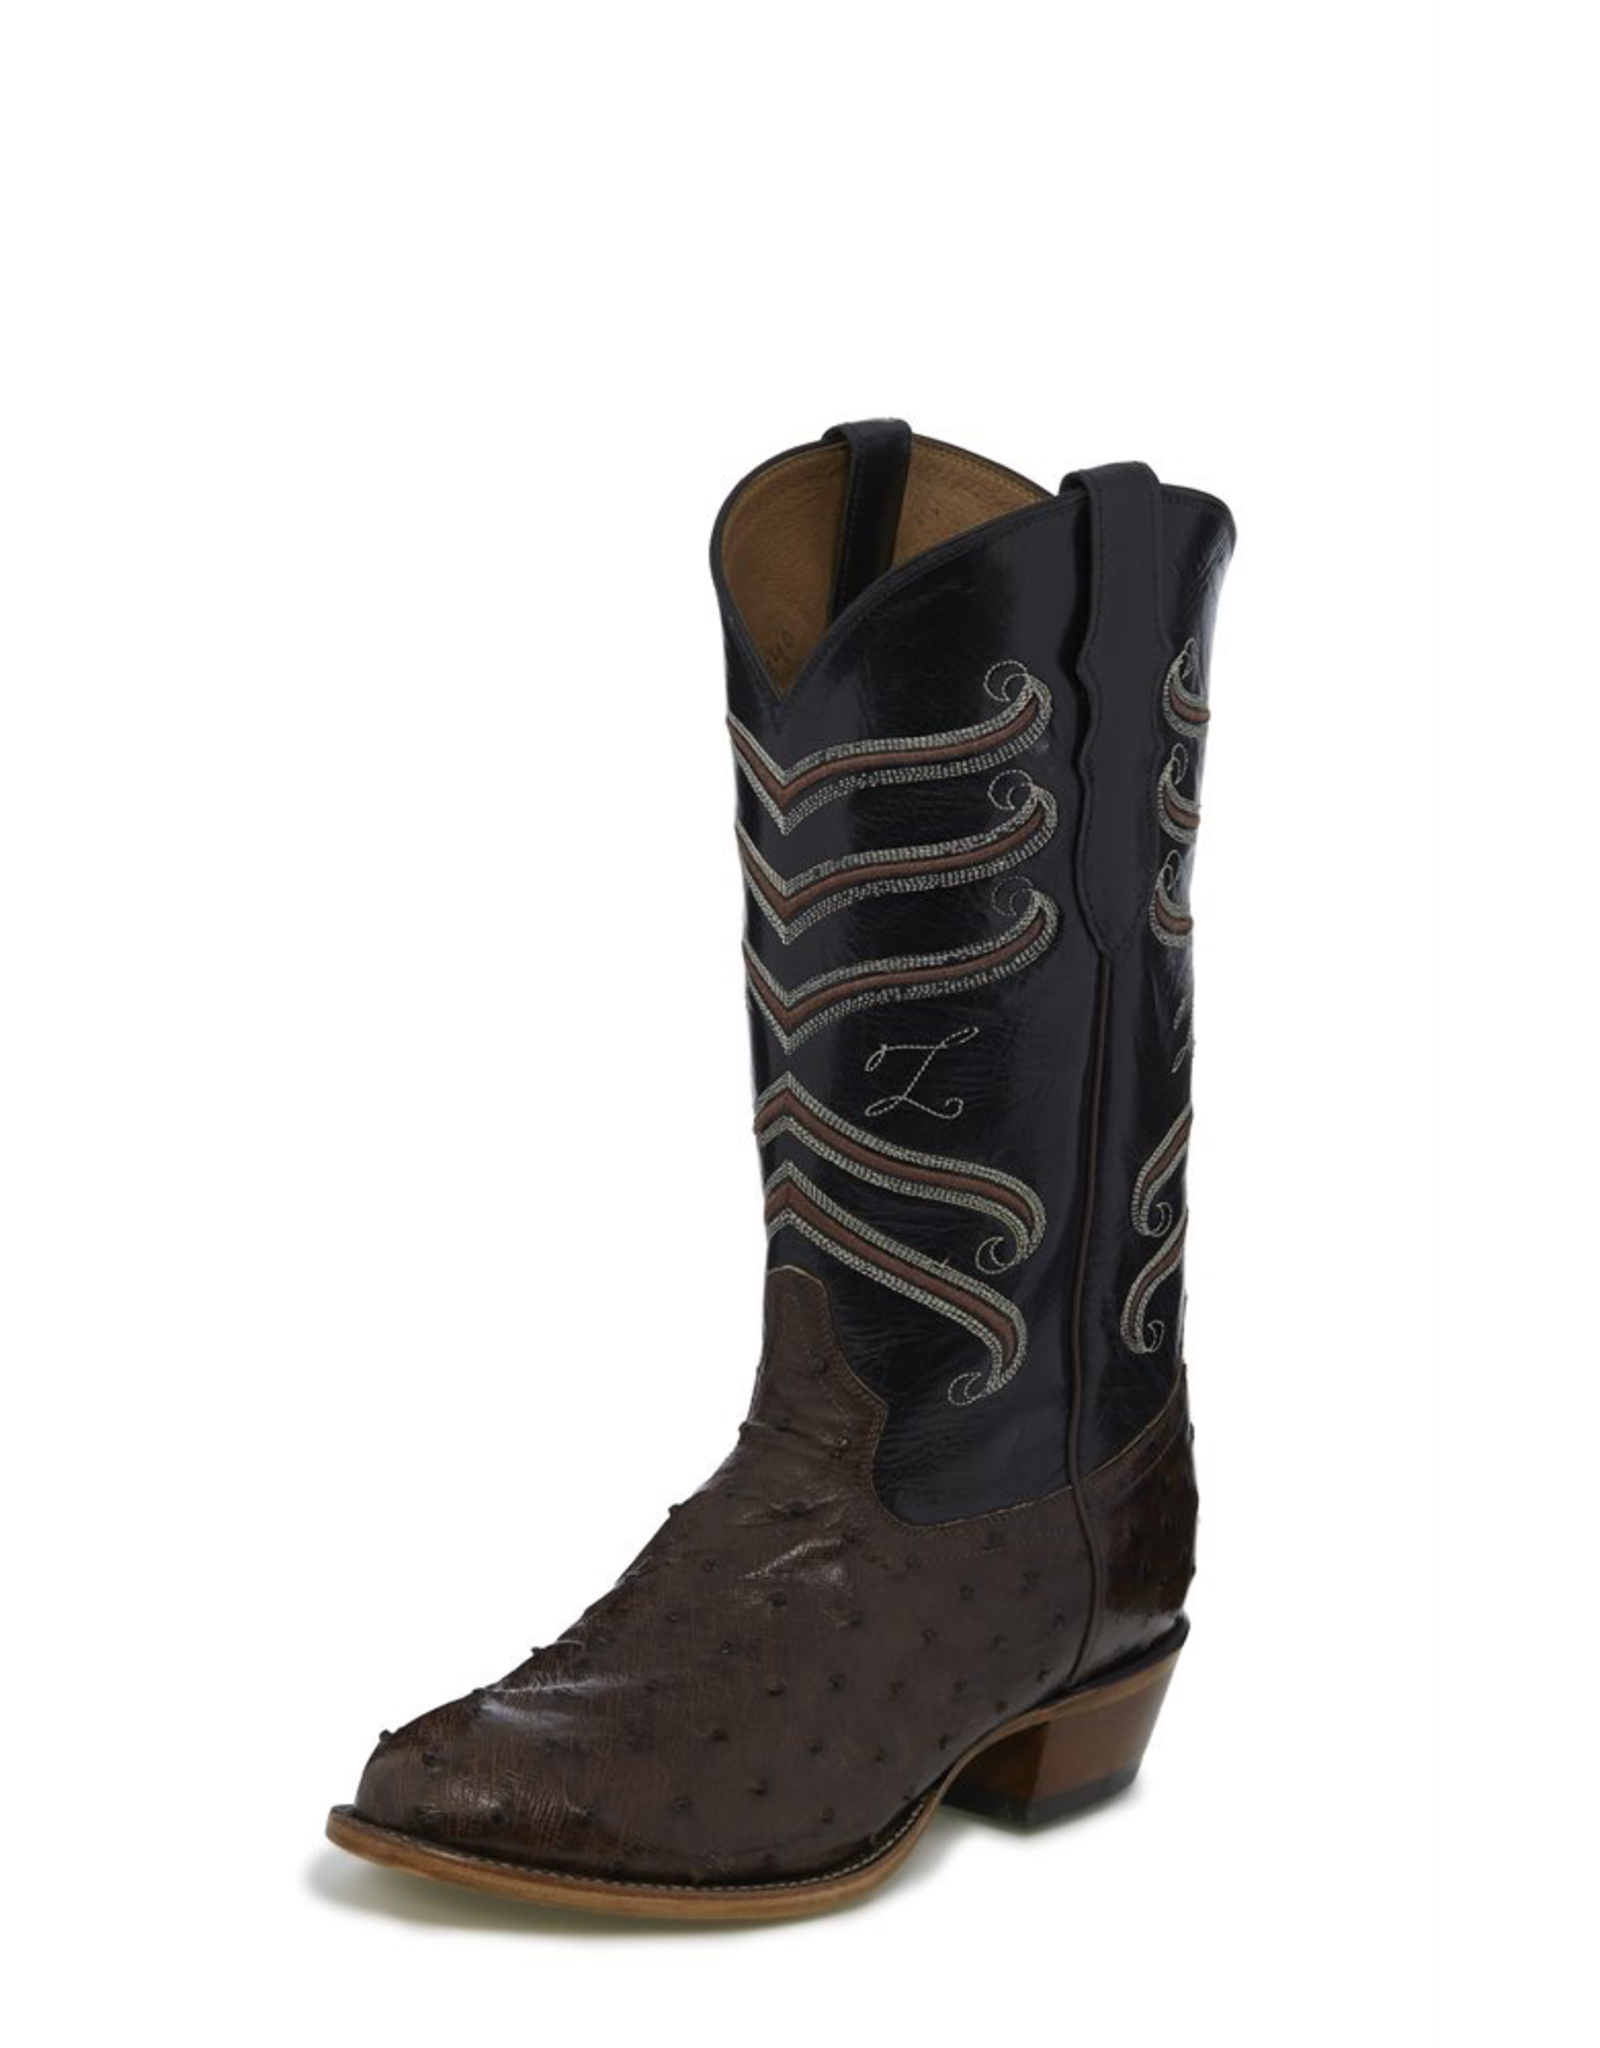 Boots-Men TONY LAMA CT840 Hermoso Full Quill